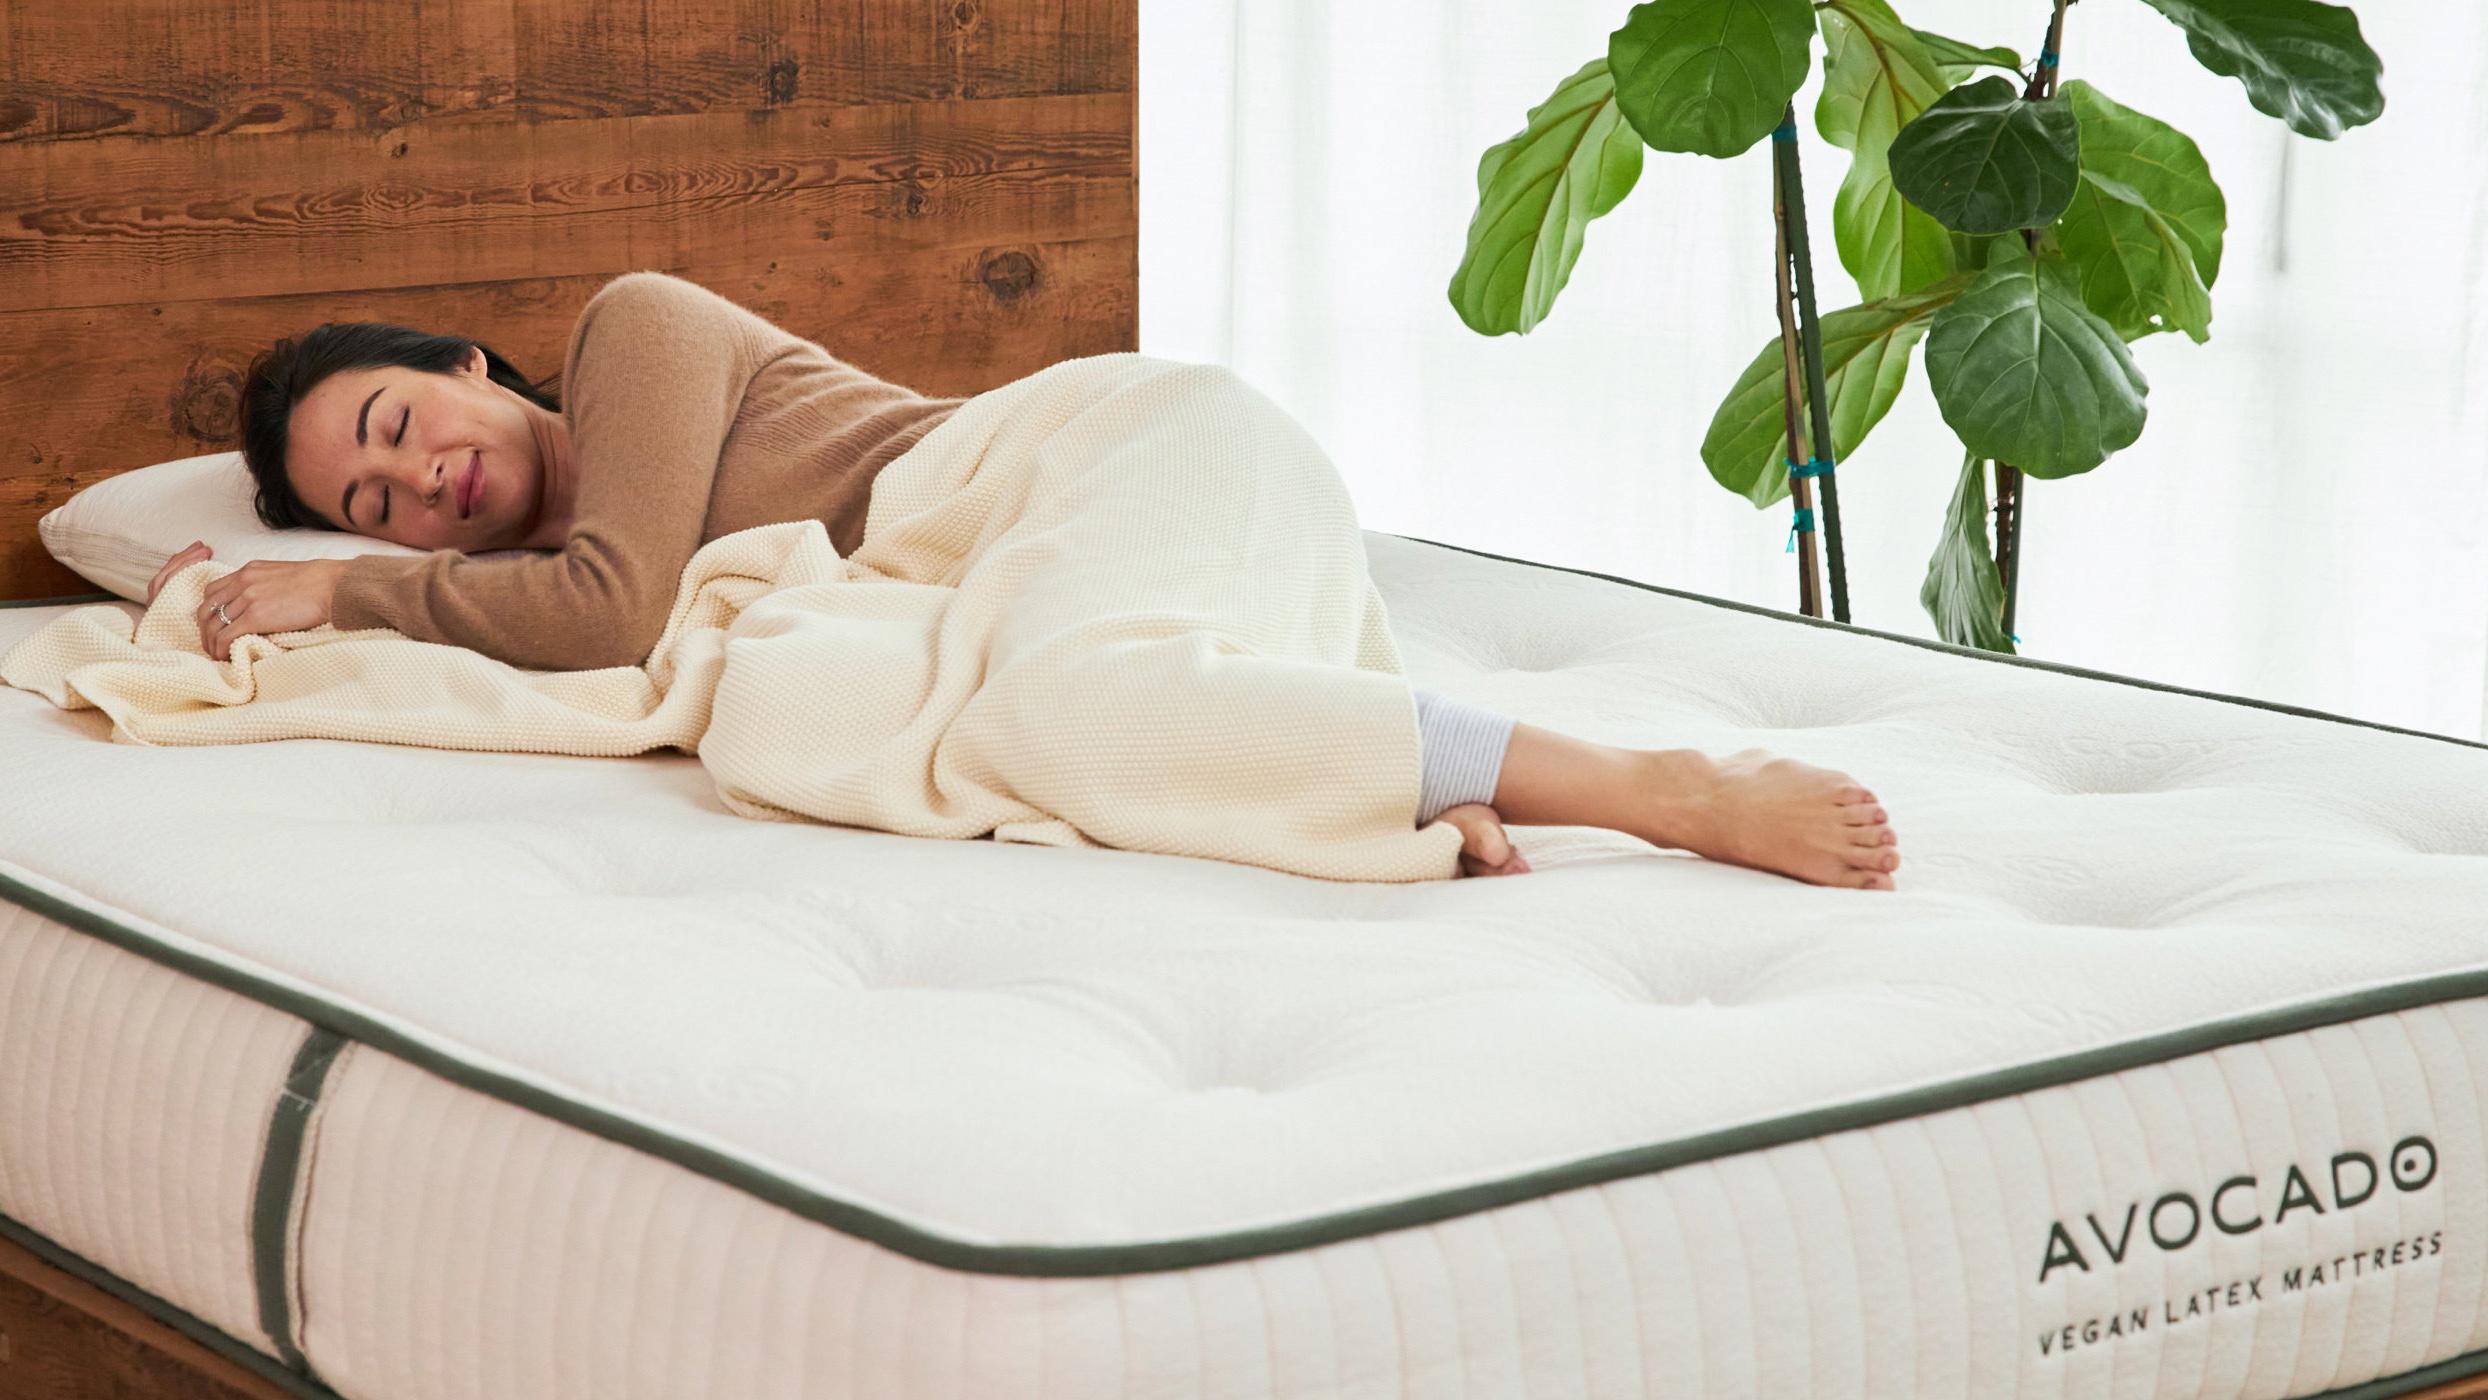 Saatva vs Avocado: A woman with brown hair sleeps on top of the Avocado Vegan Latex Mattress